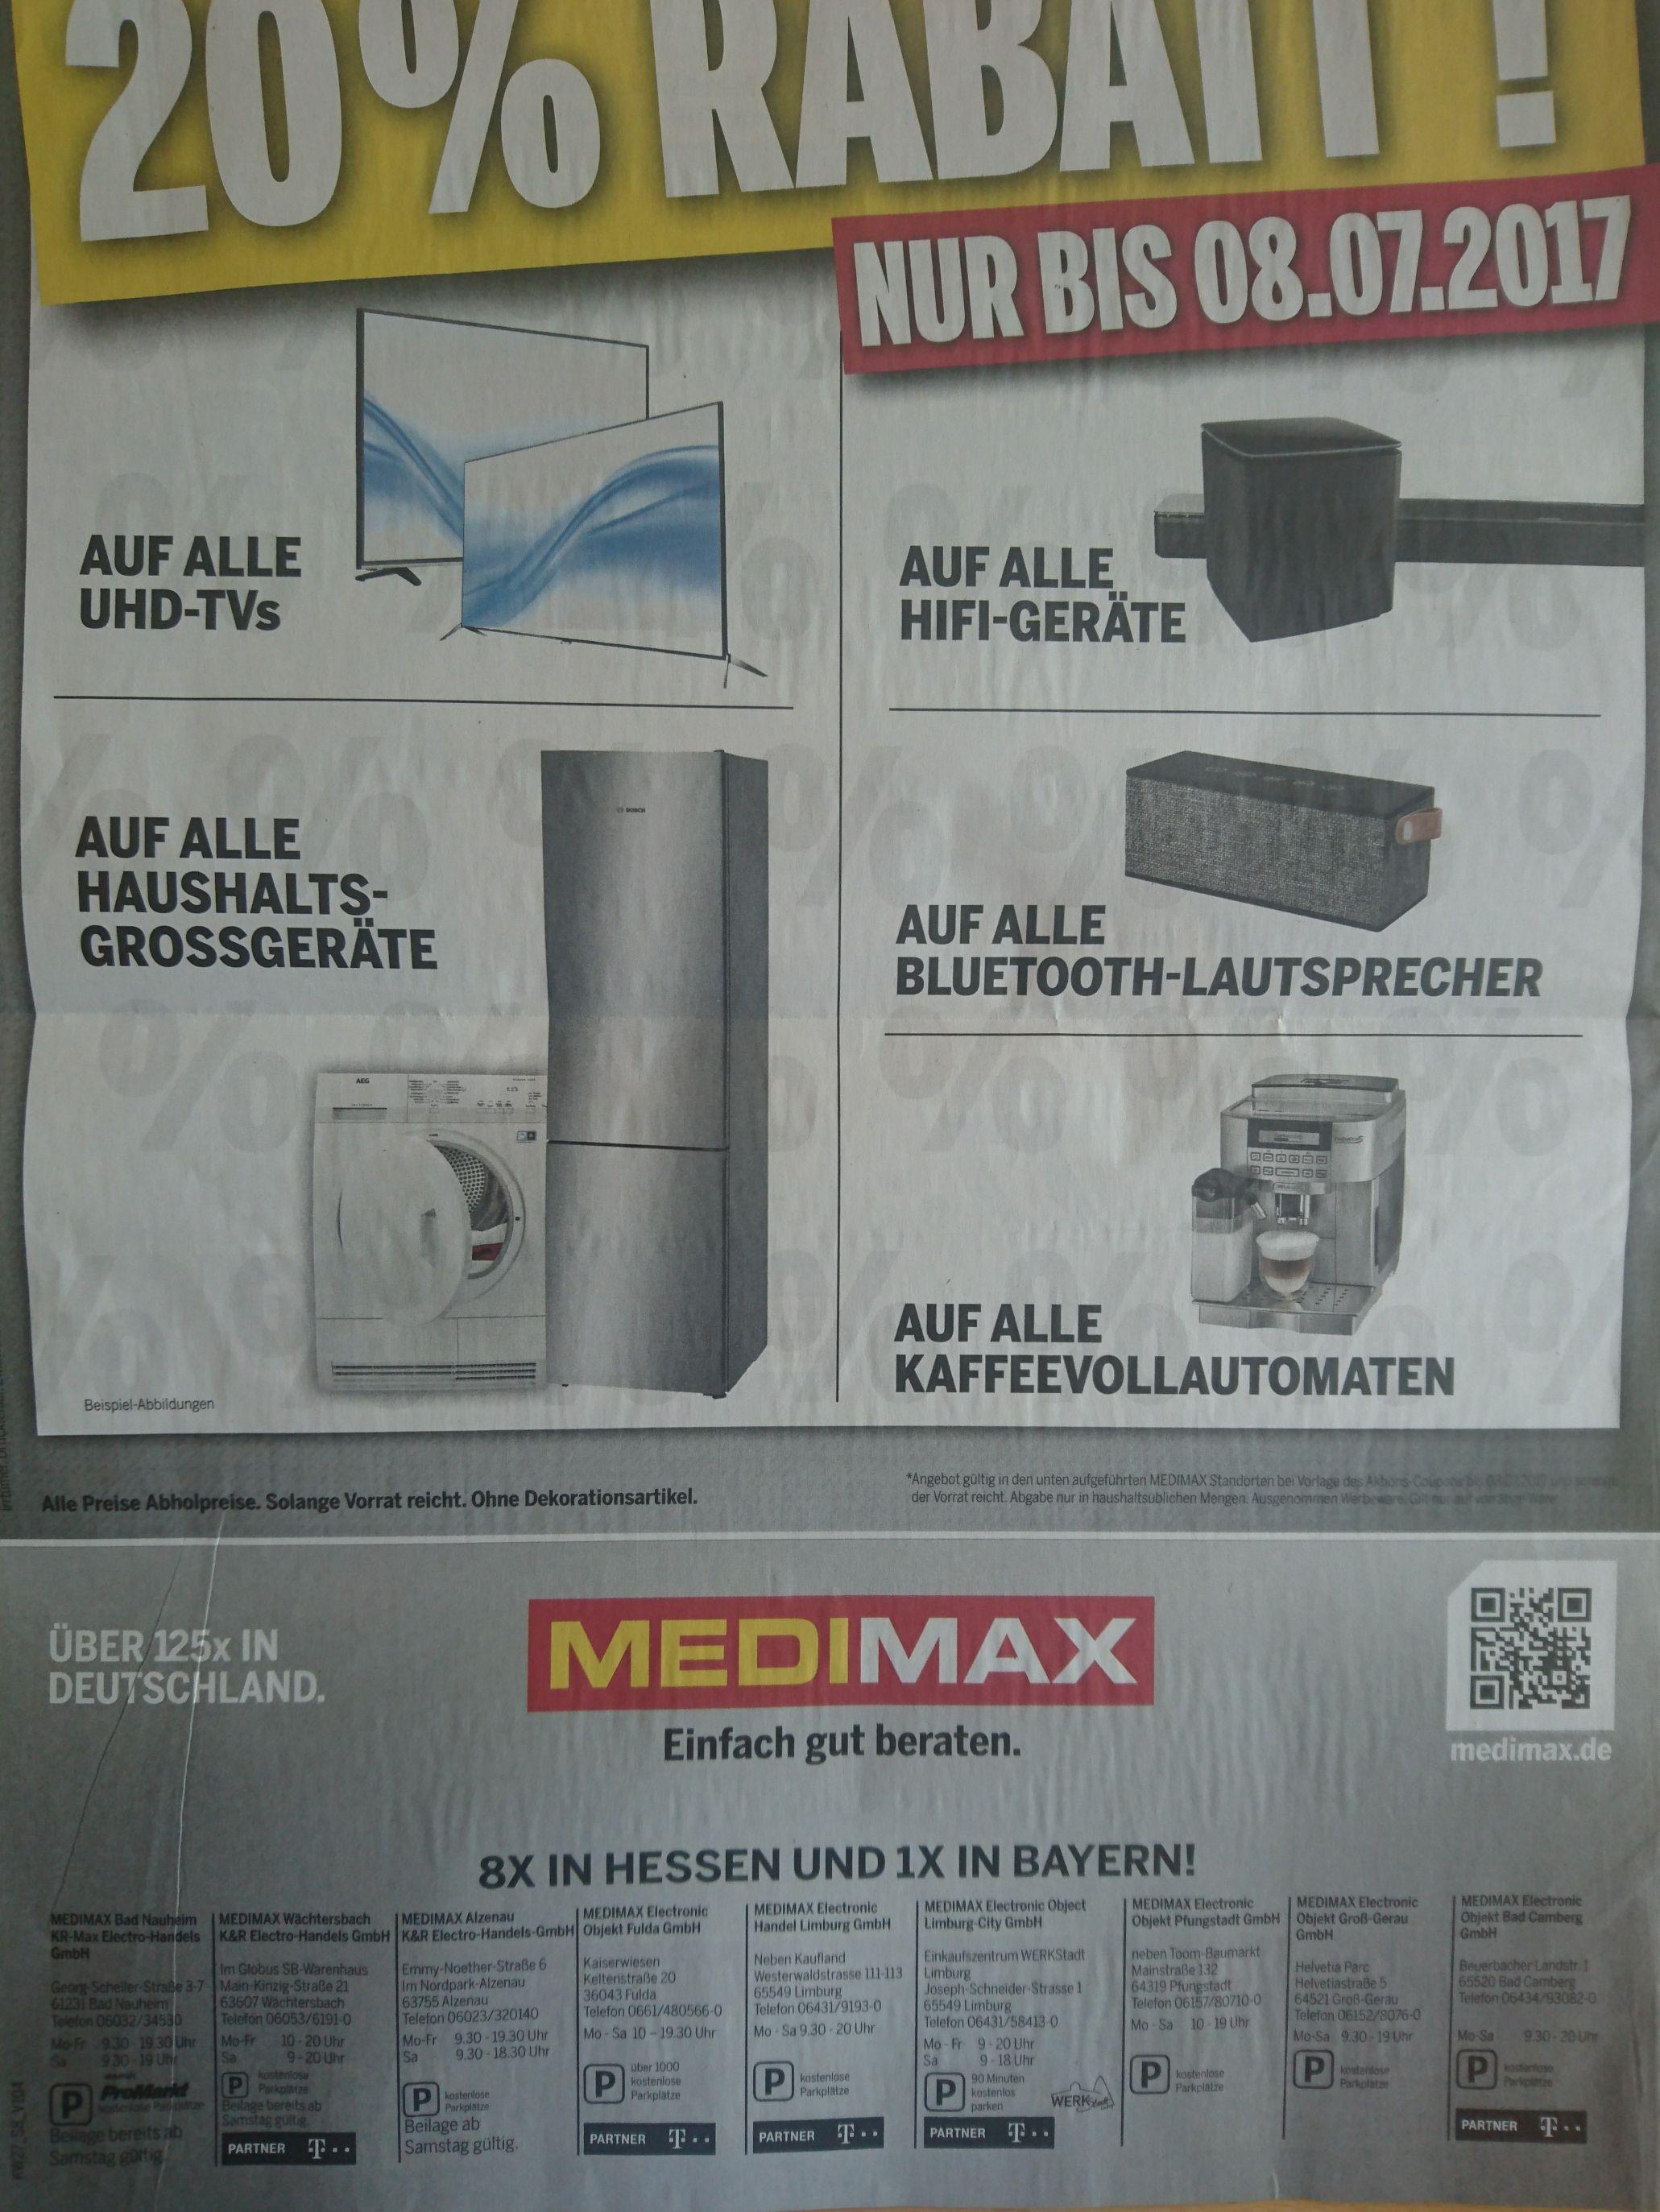 20% (Regional Hessen) Medimax: UHD TV, Großgeräte, Kaffee Automaten, BT LS, HiFi